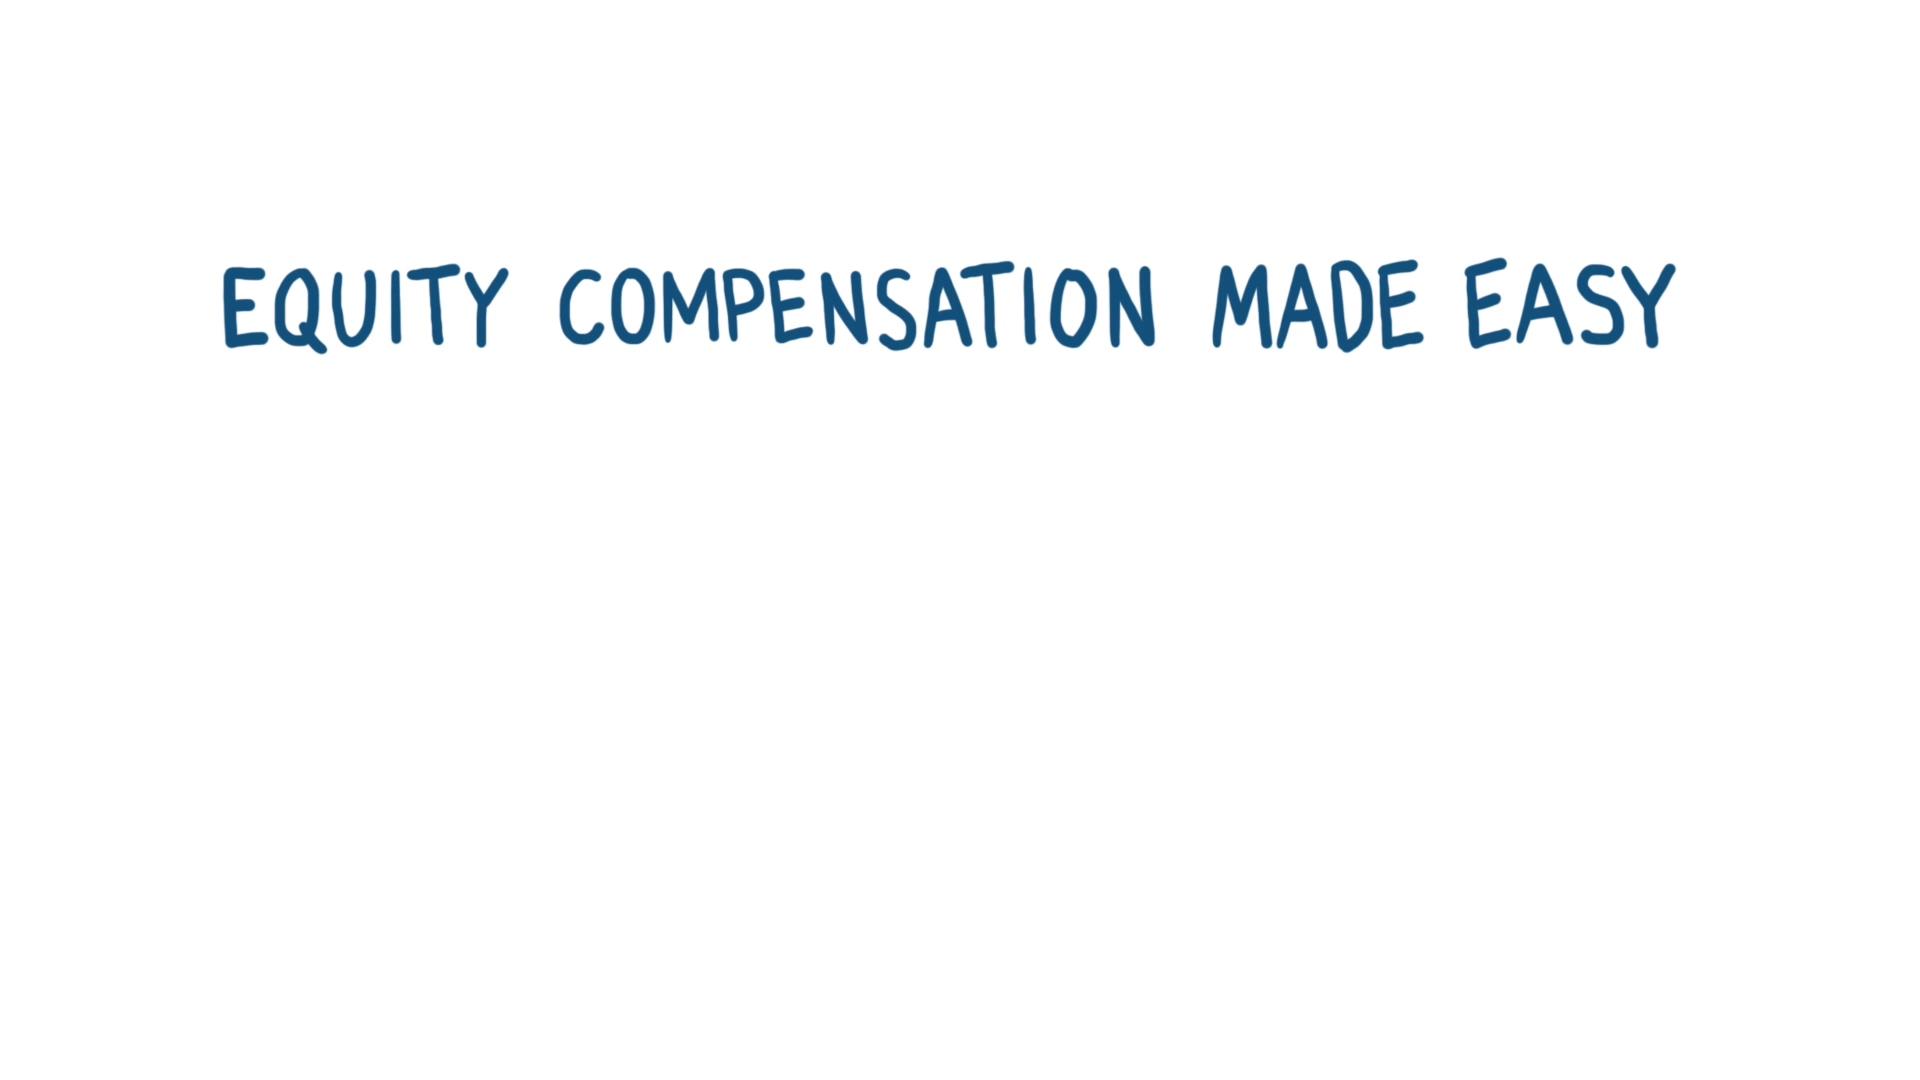 Evli Awards Management - Equity Compensation